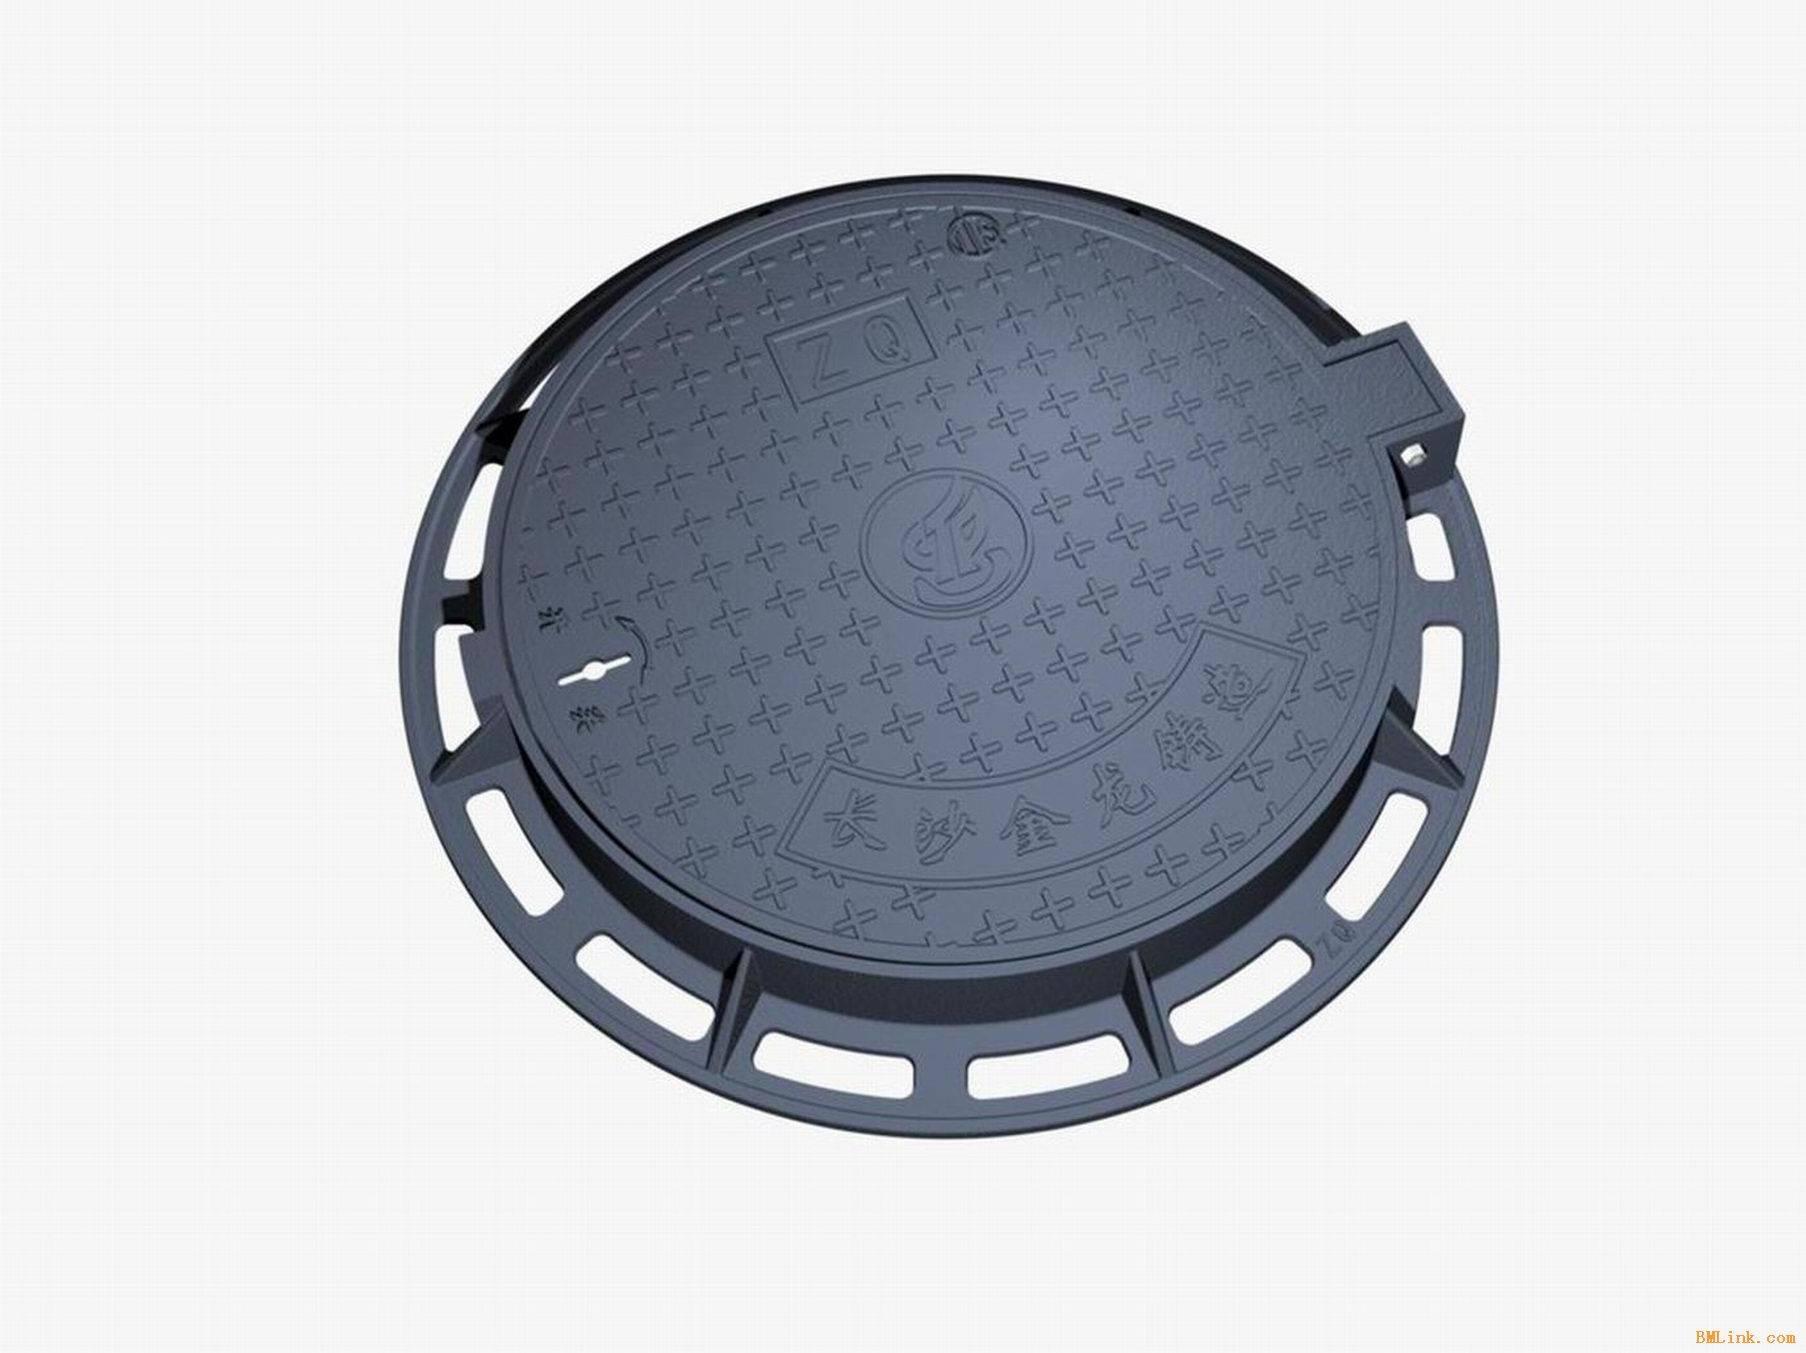 Ductile Iron Manhole Cover, Cast Iron Manhole Cover Exporter in China